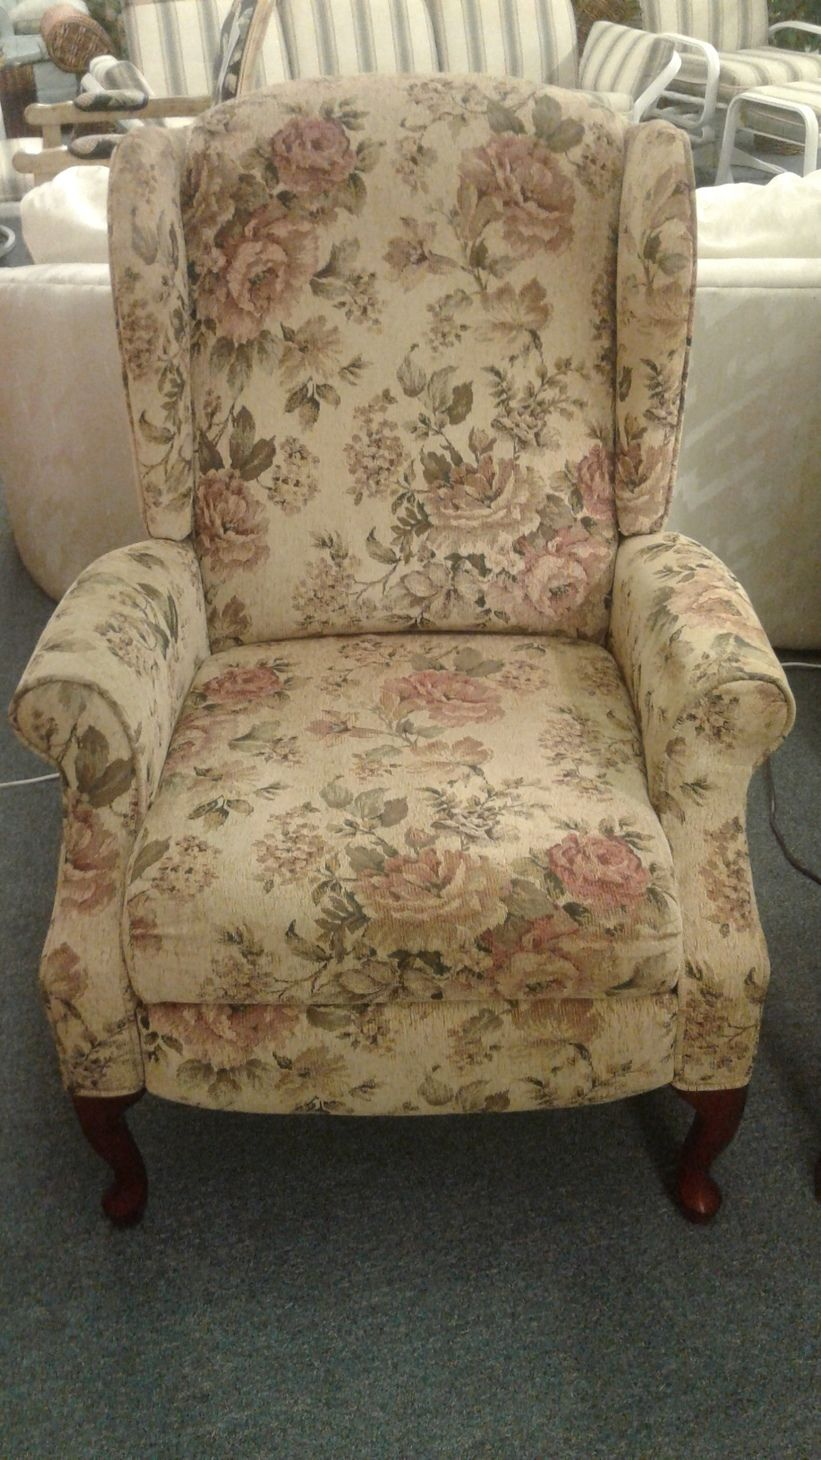 LANE FLORAL PUSH BACK RECLINER Delmarva Furniture